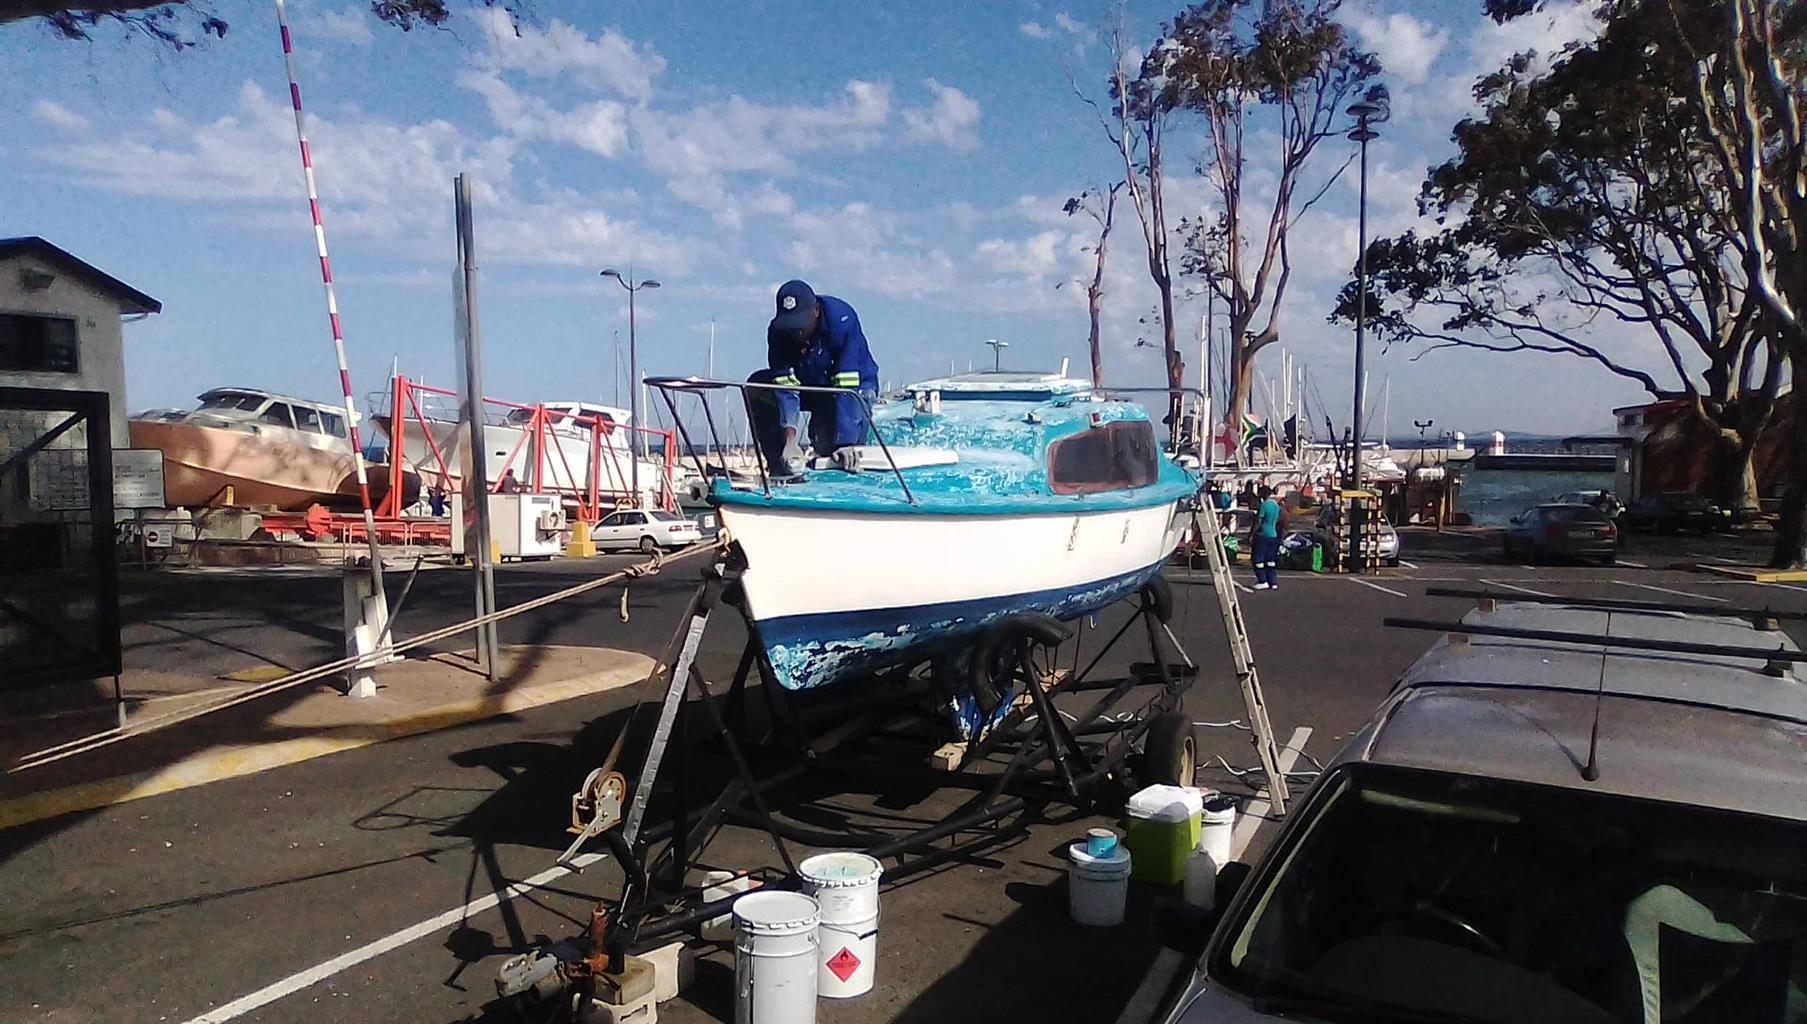 19 Ft C Sharp Fixed Keel Sailboat . Mast . Motor and Sails on Trailer